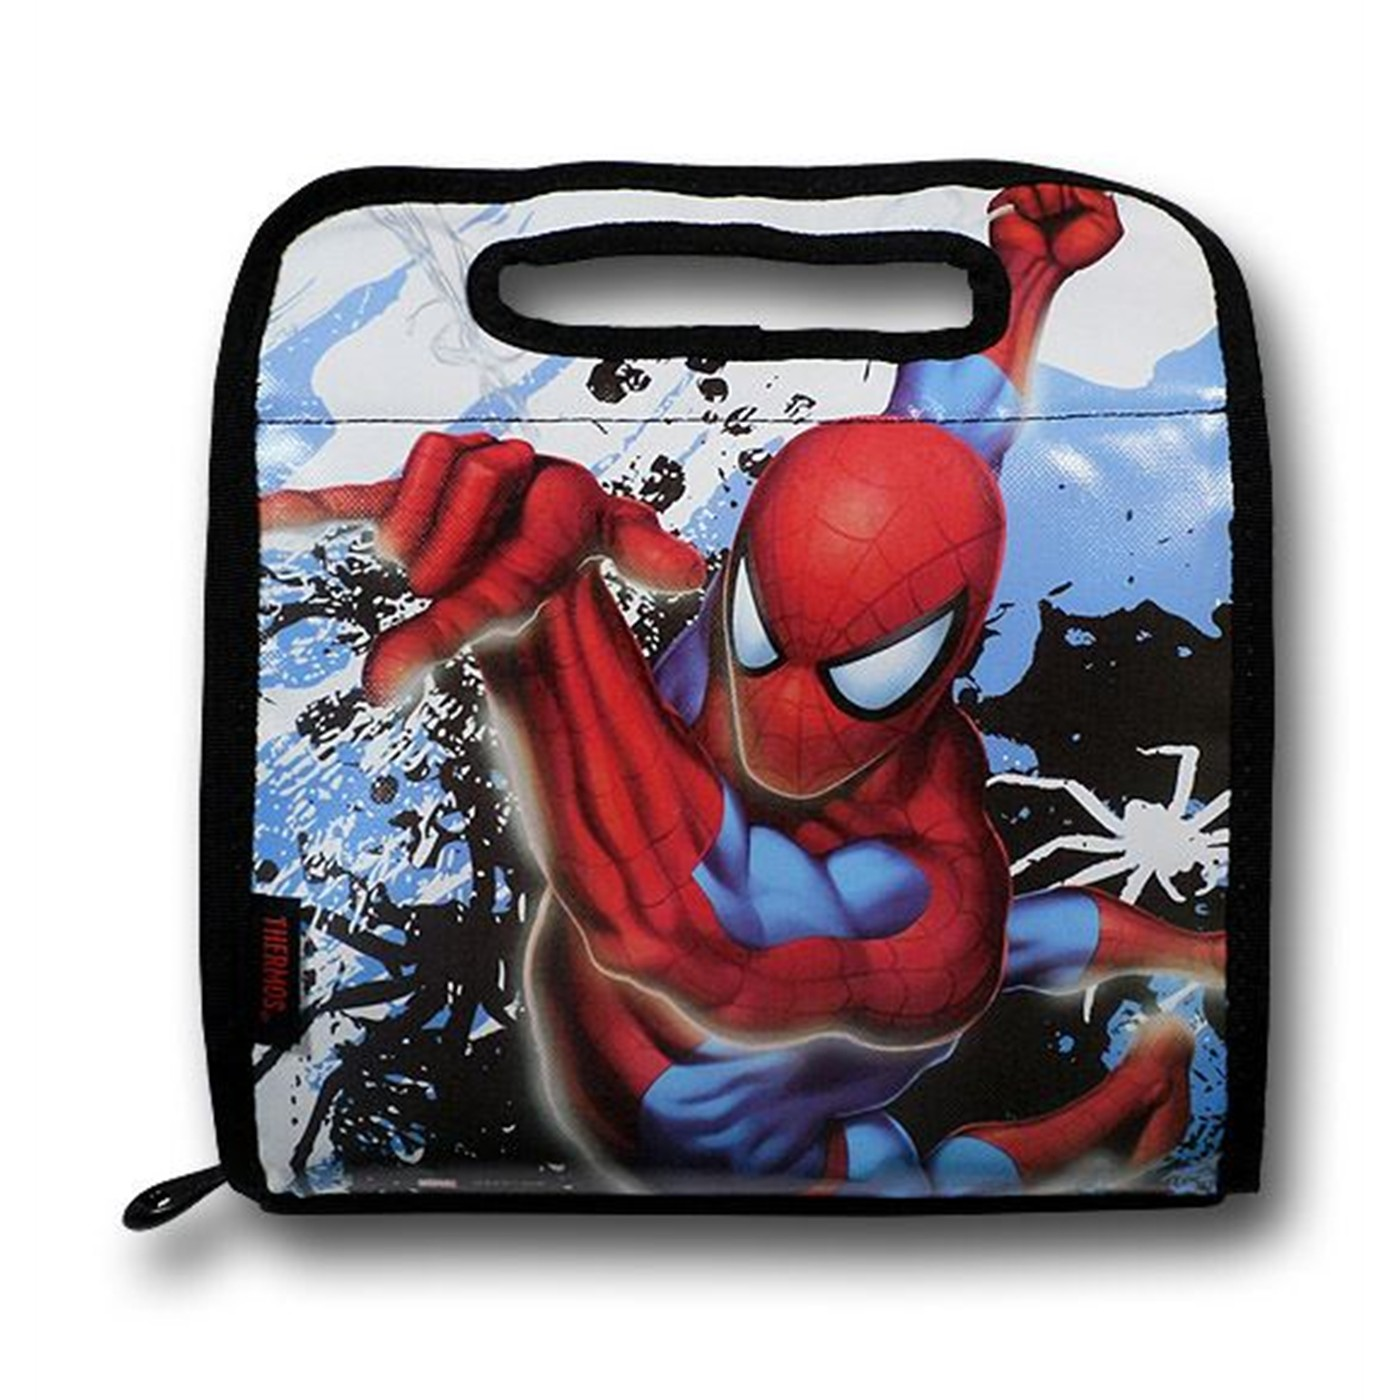 Spiderman Lunch Sack